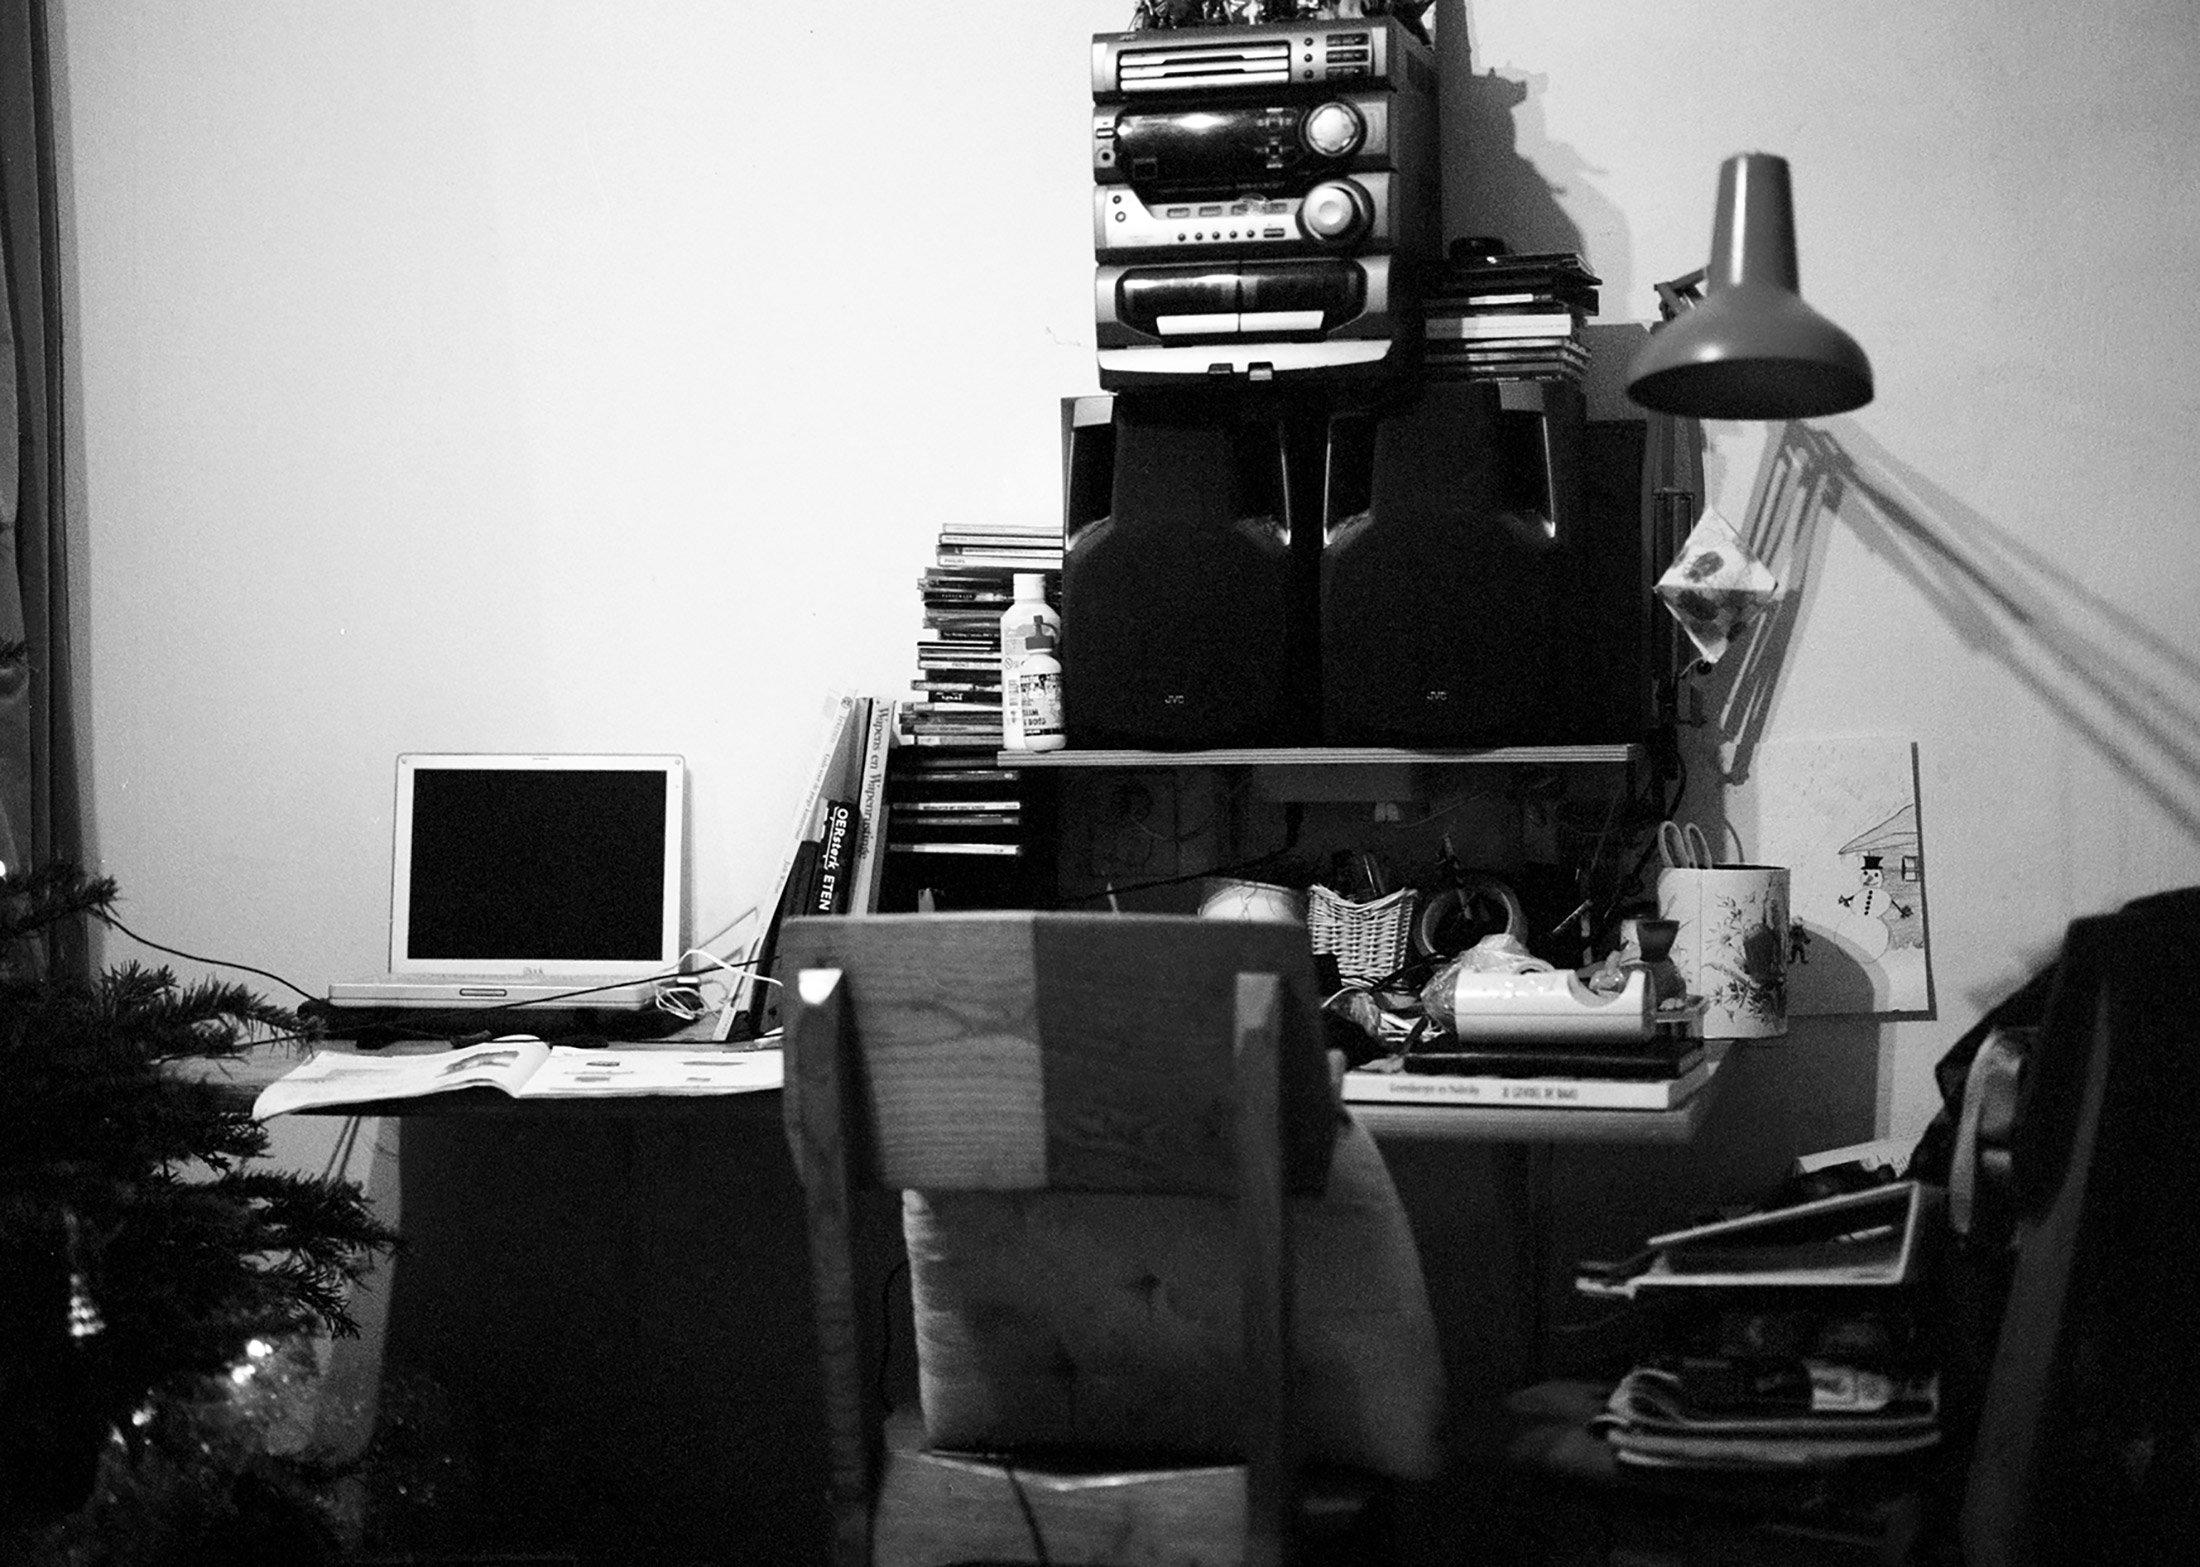 De Klopvaart woonkamer / Living room at 'de Klopvaart'